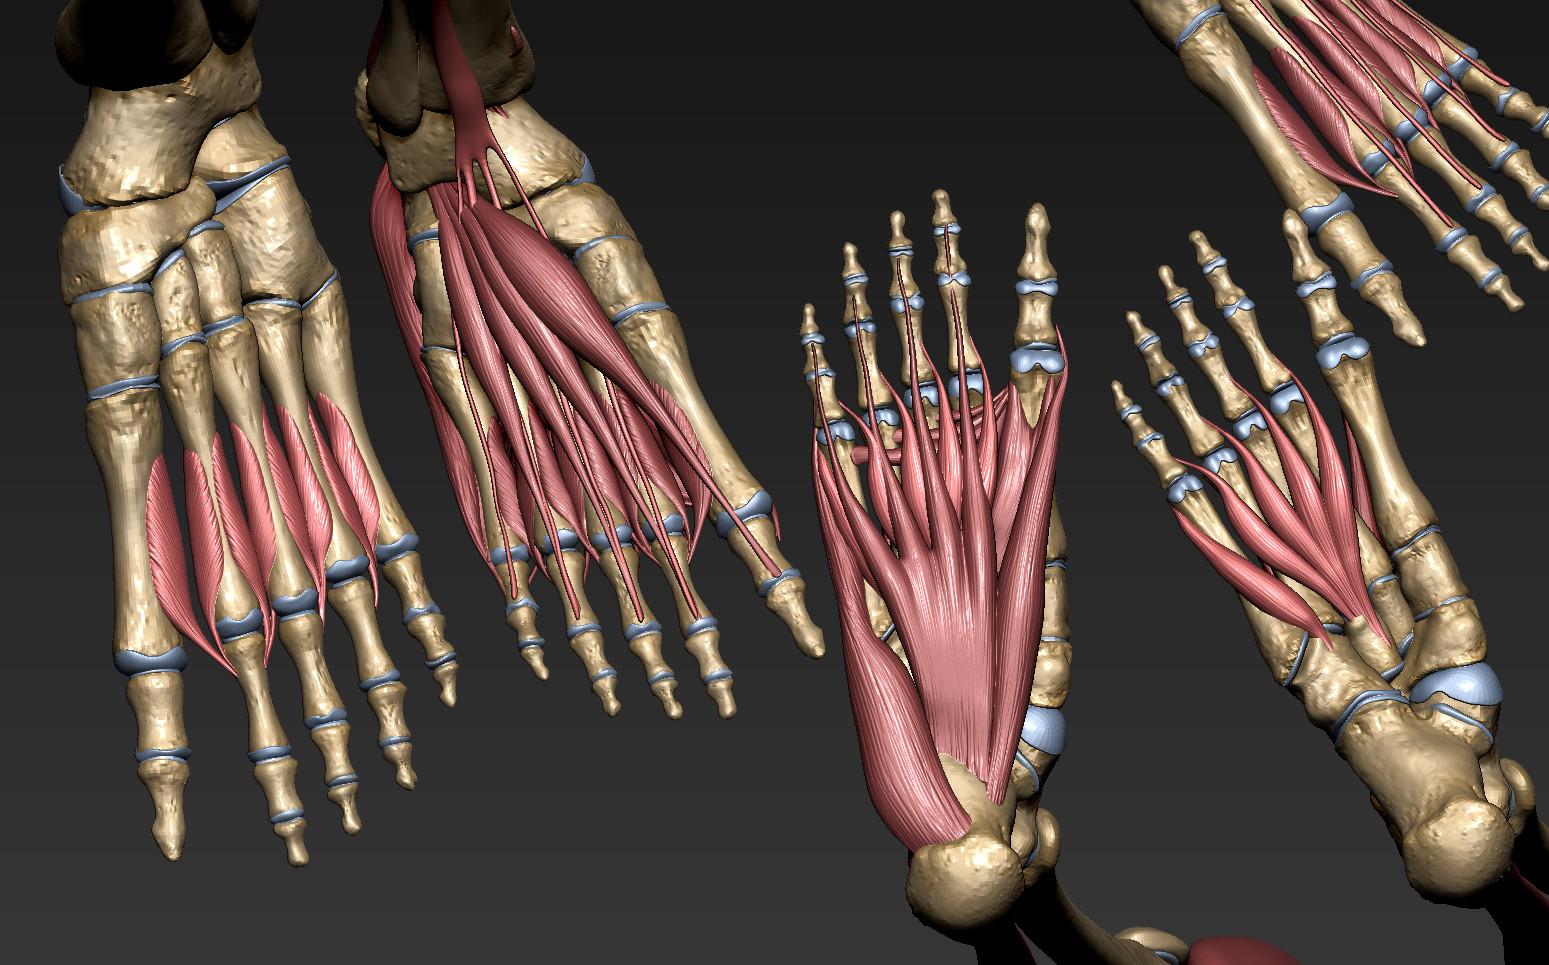 Andrey gritsuk leg muscles 1